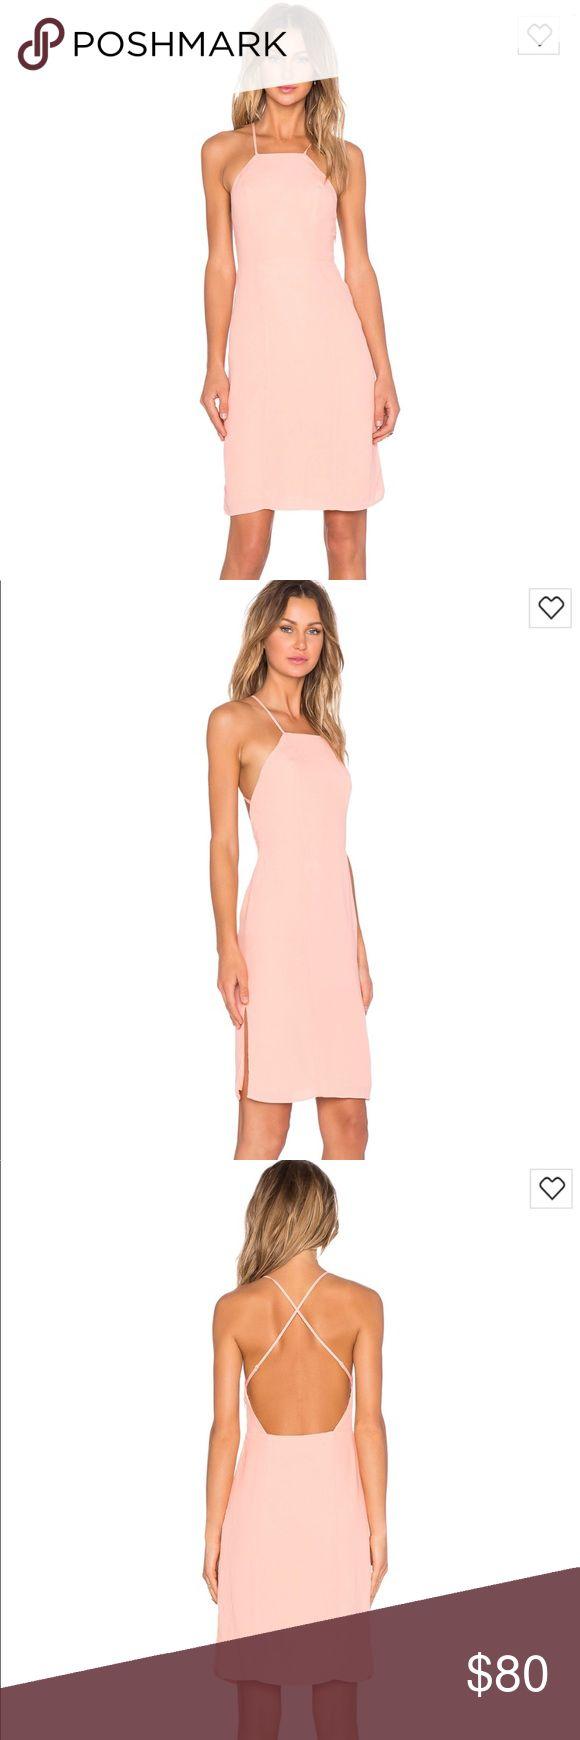 Dackery cocktail dress